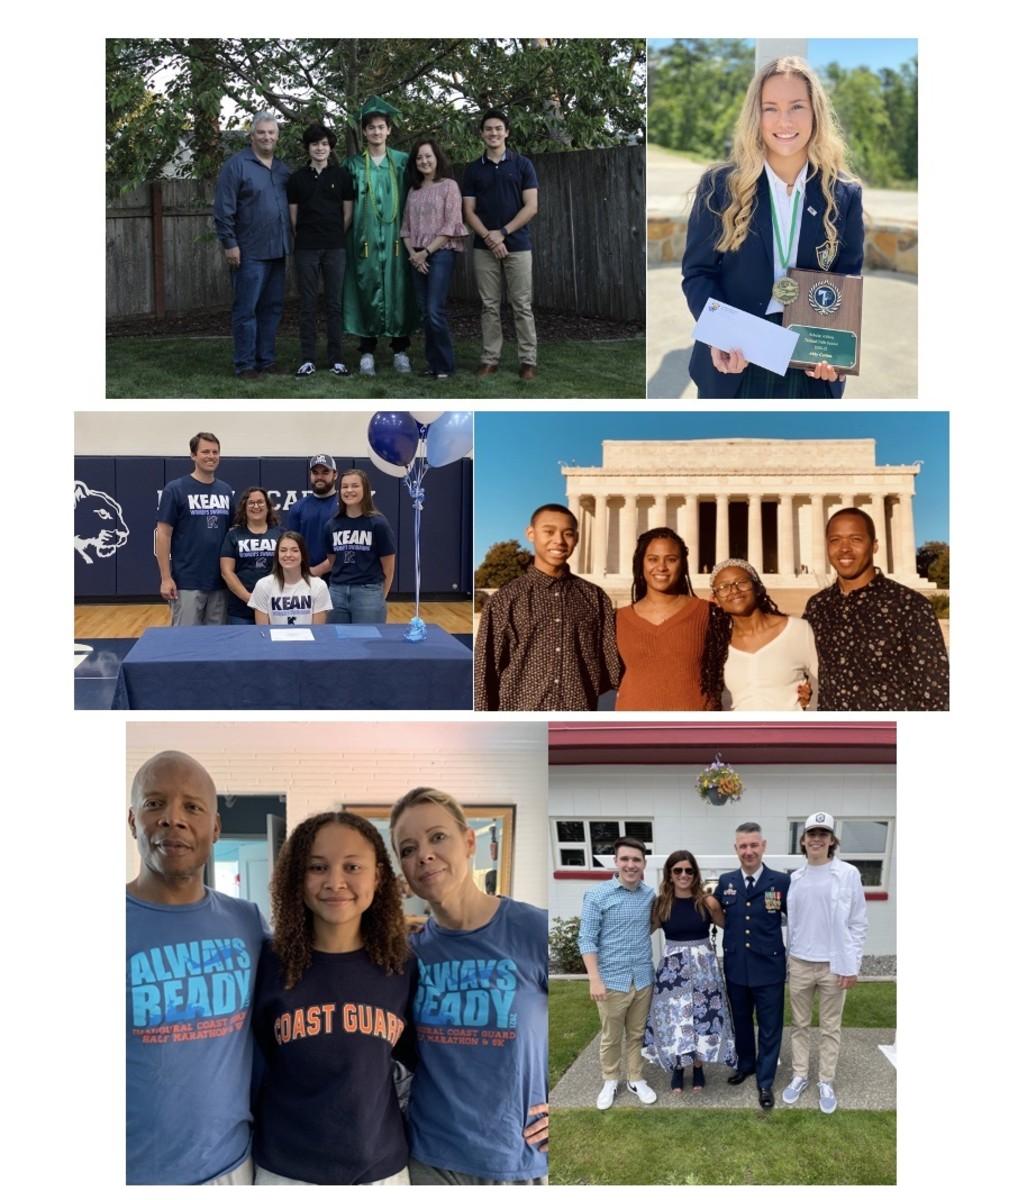 From top left: Students Christopher Albert, Abby Carlan, Isabel DeSanno, Amar Dunham, Kianna Fleek-Dixon and Ben Pierias